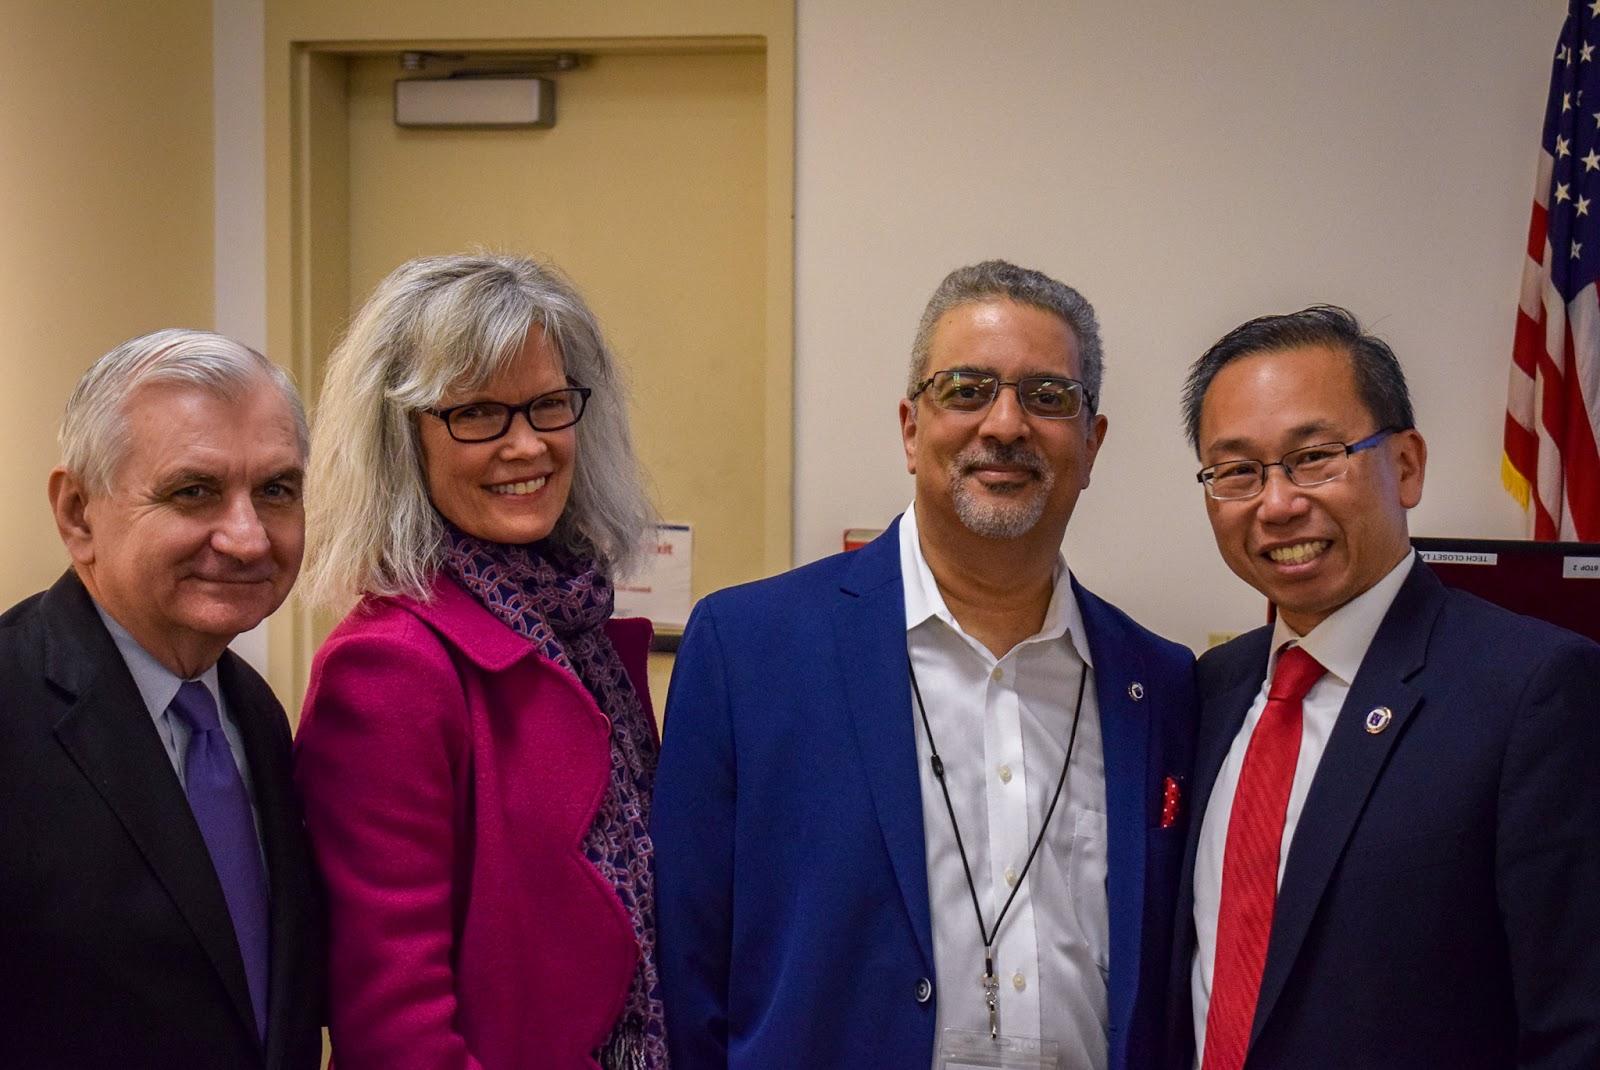 Senator Reed, Dr. Matthew, CPL Director Ed Garcia, and Cranston Mayor Allan Fung